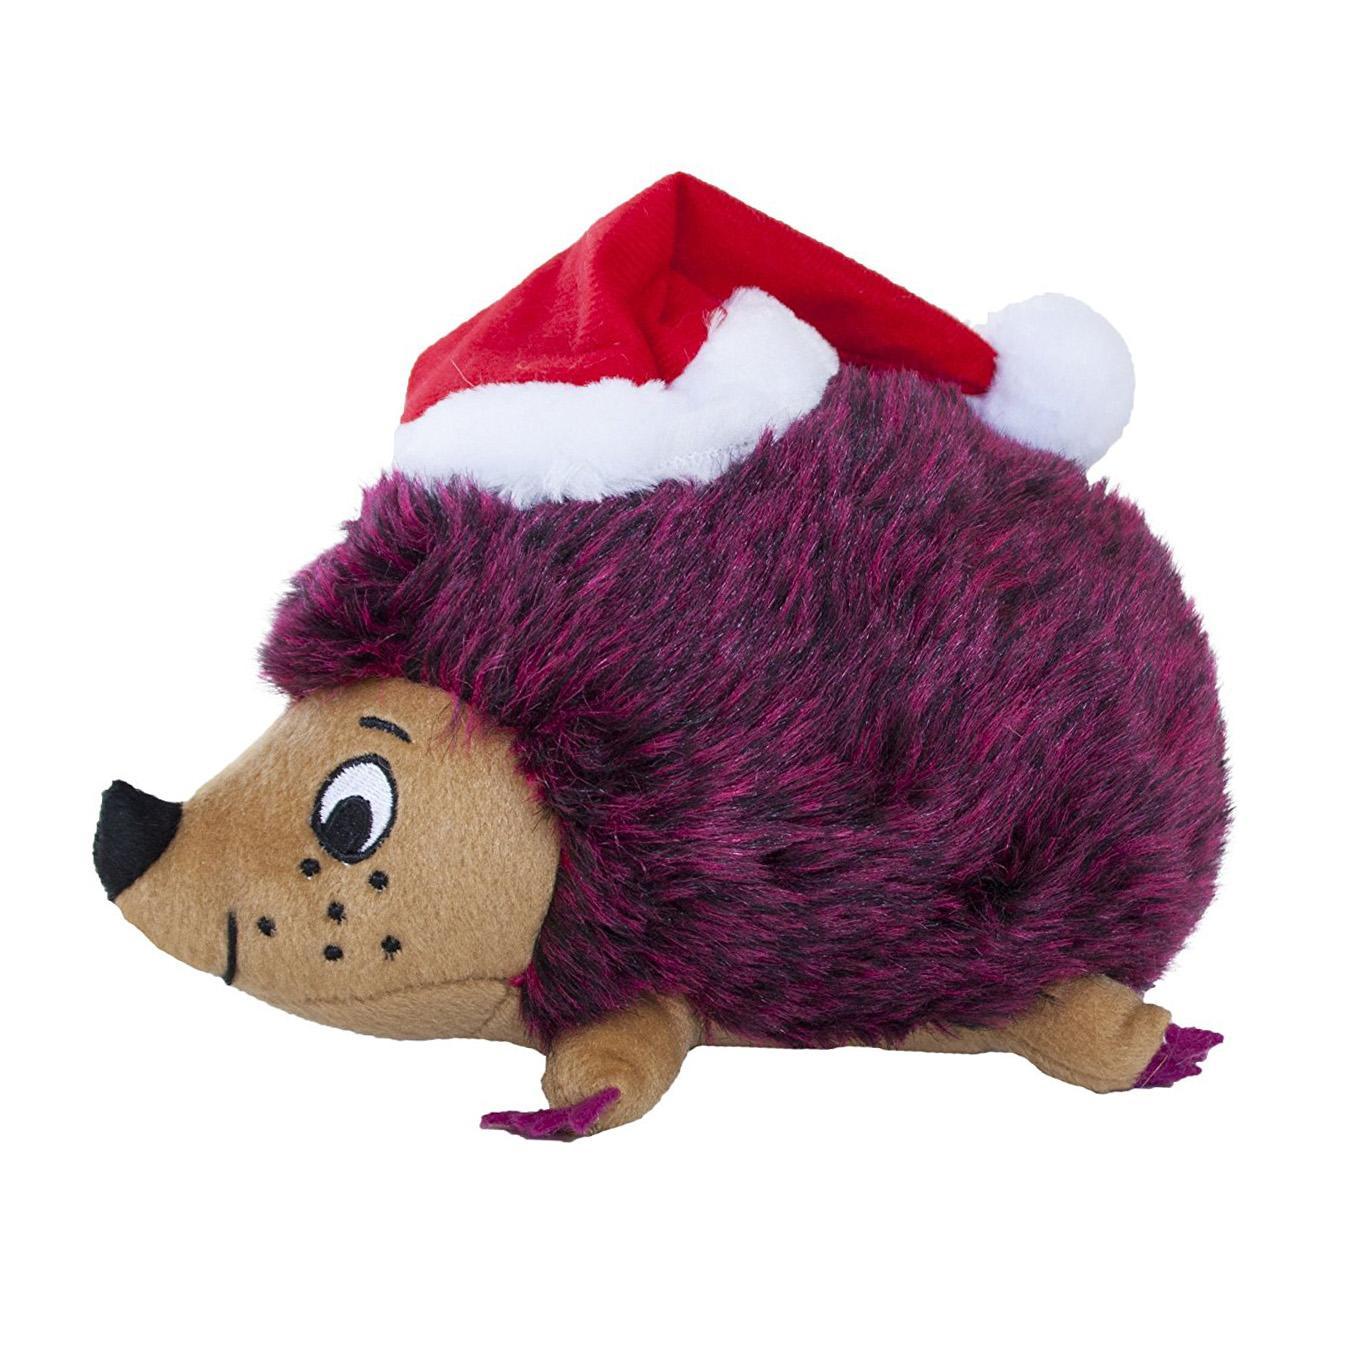 Outward Hound Holiday Hedgehog Dog Toy - Red